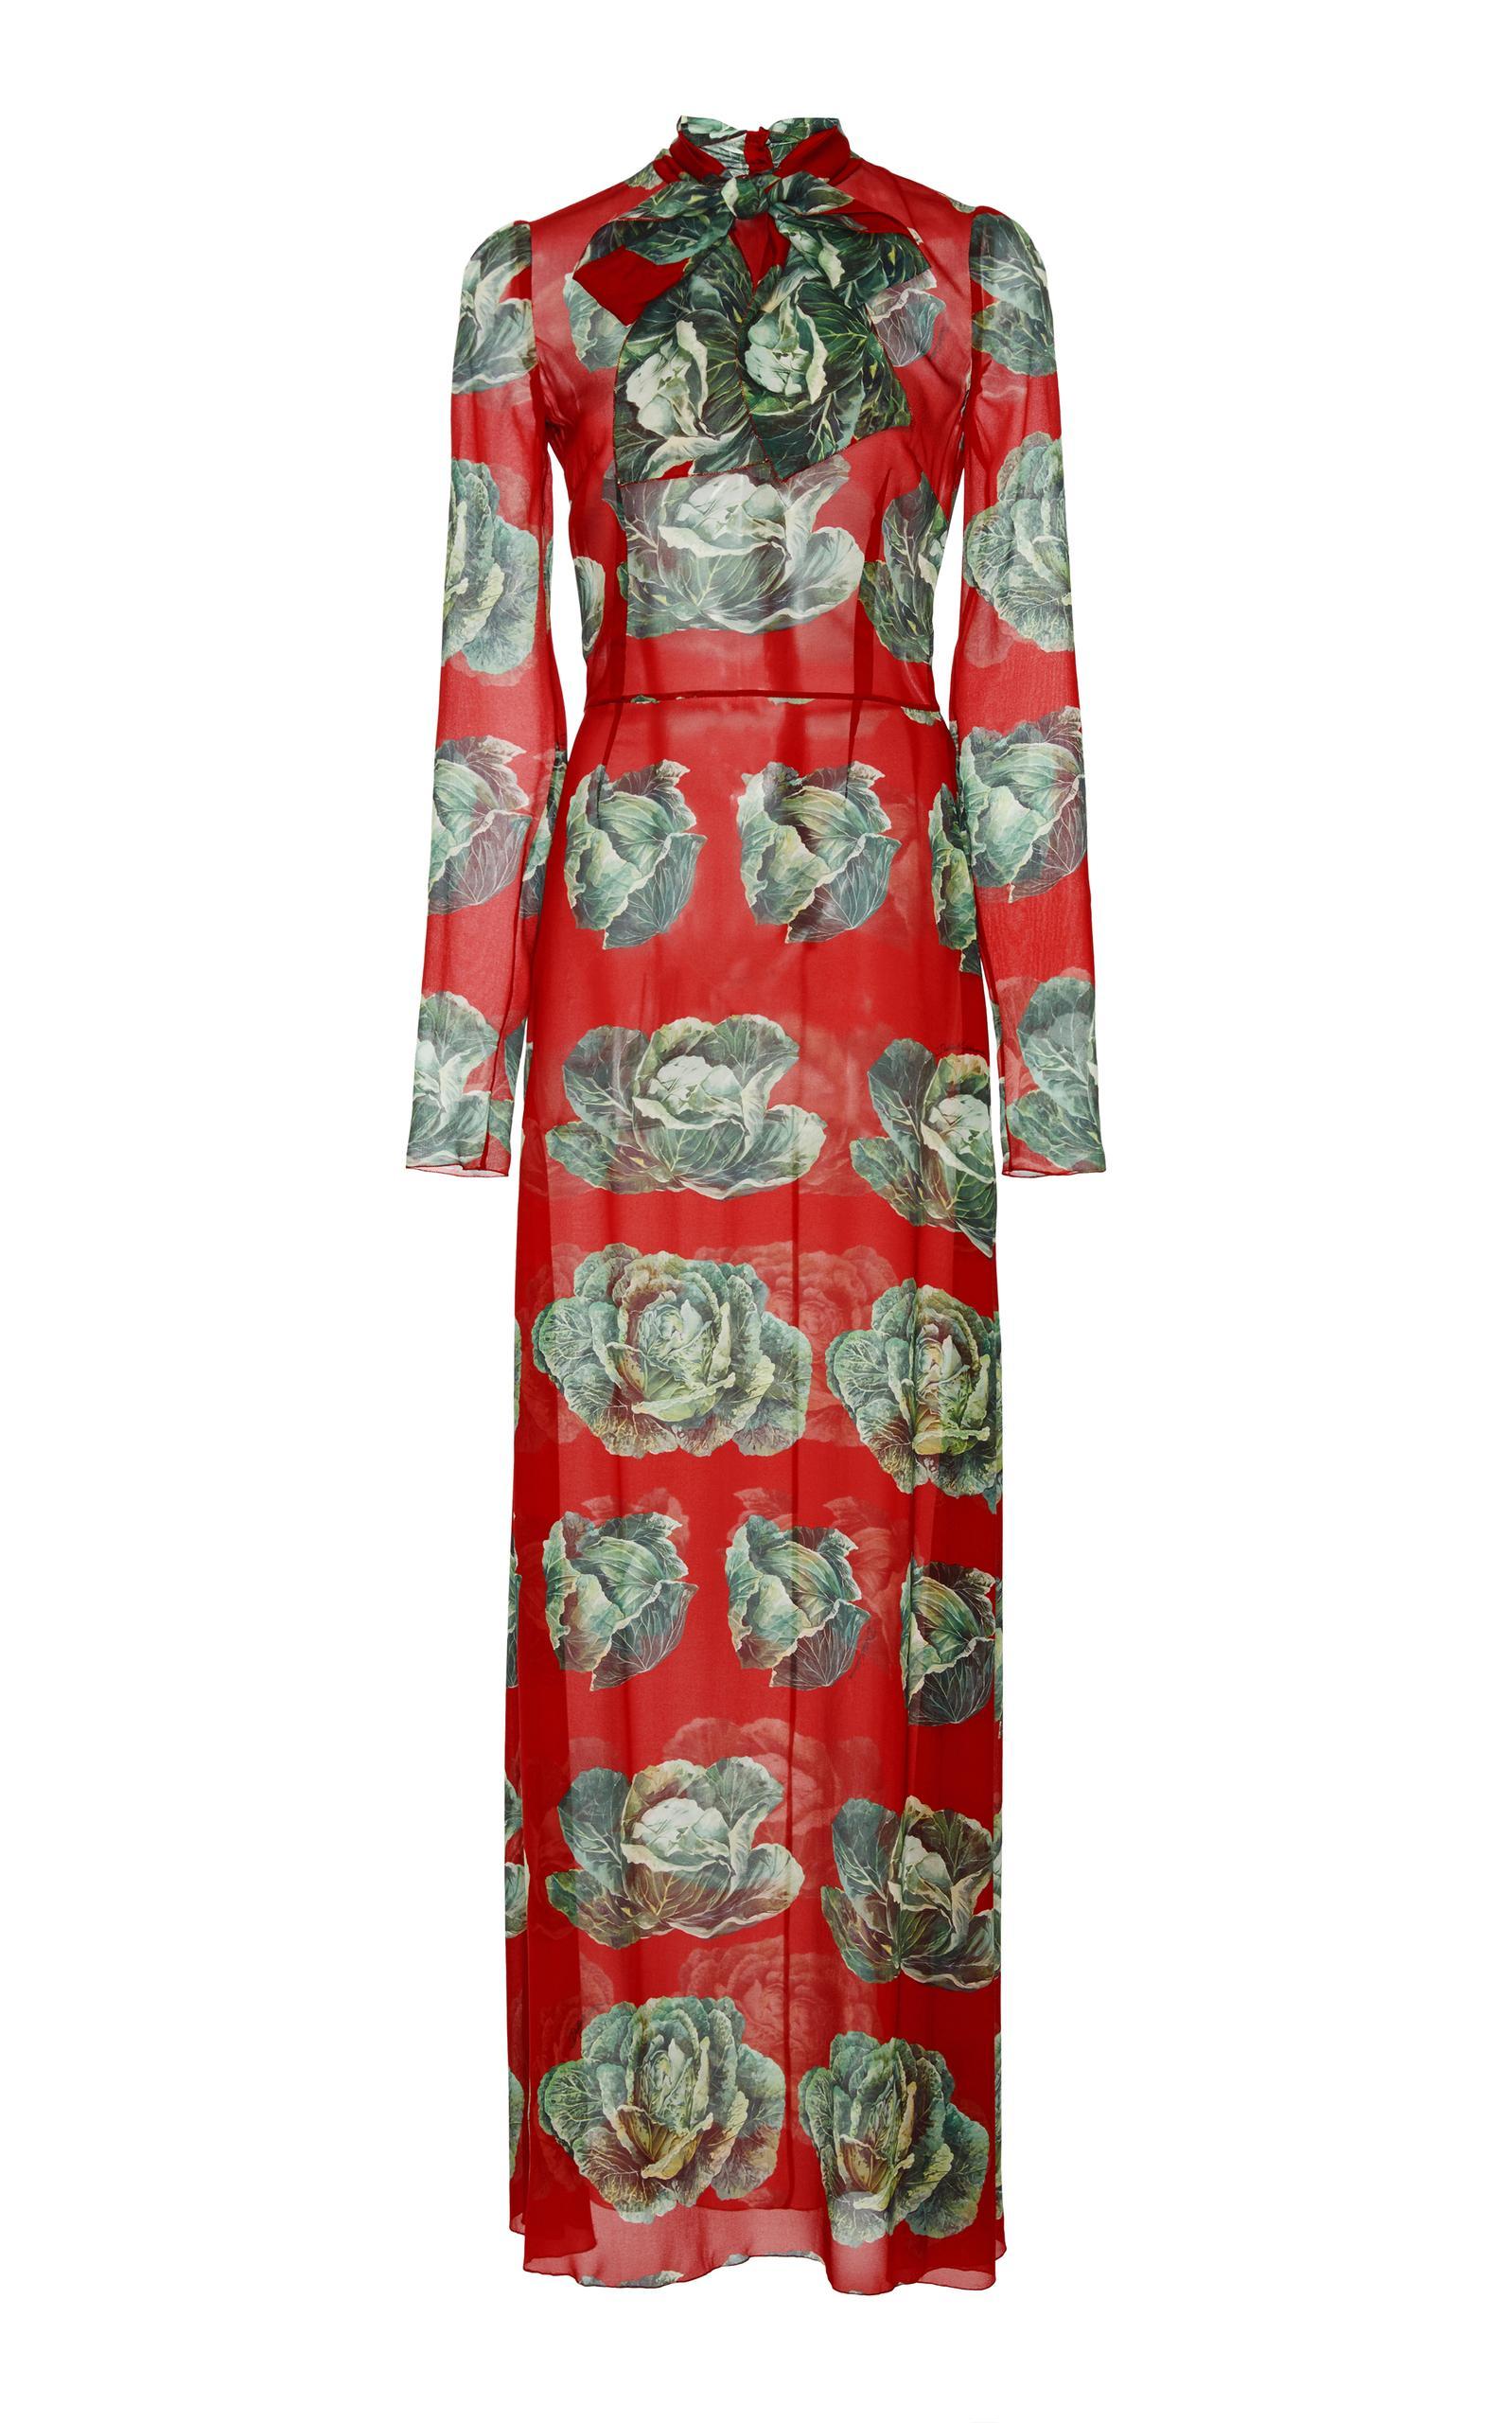 Dolce & Gabbana Cabbage Print Maxi Dress In Red